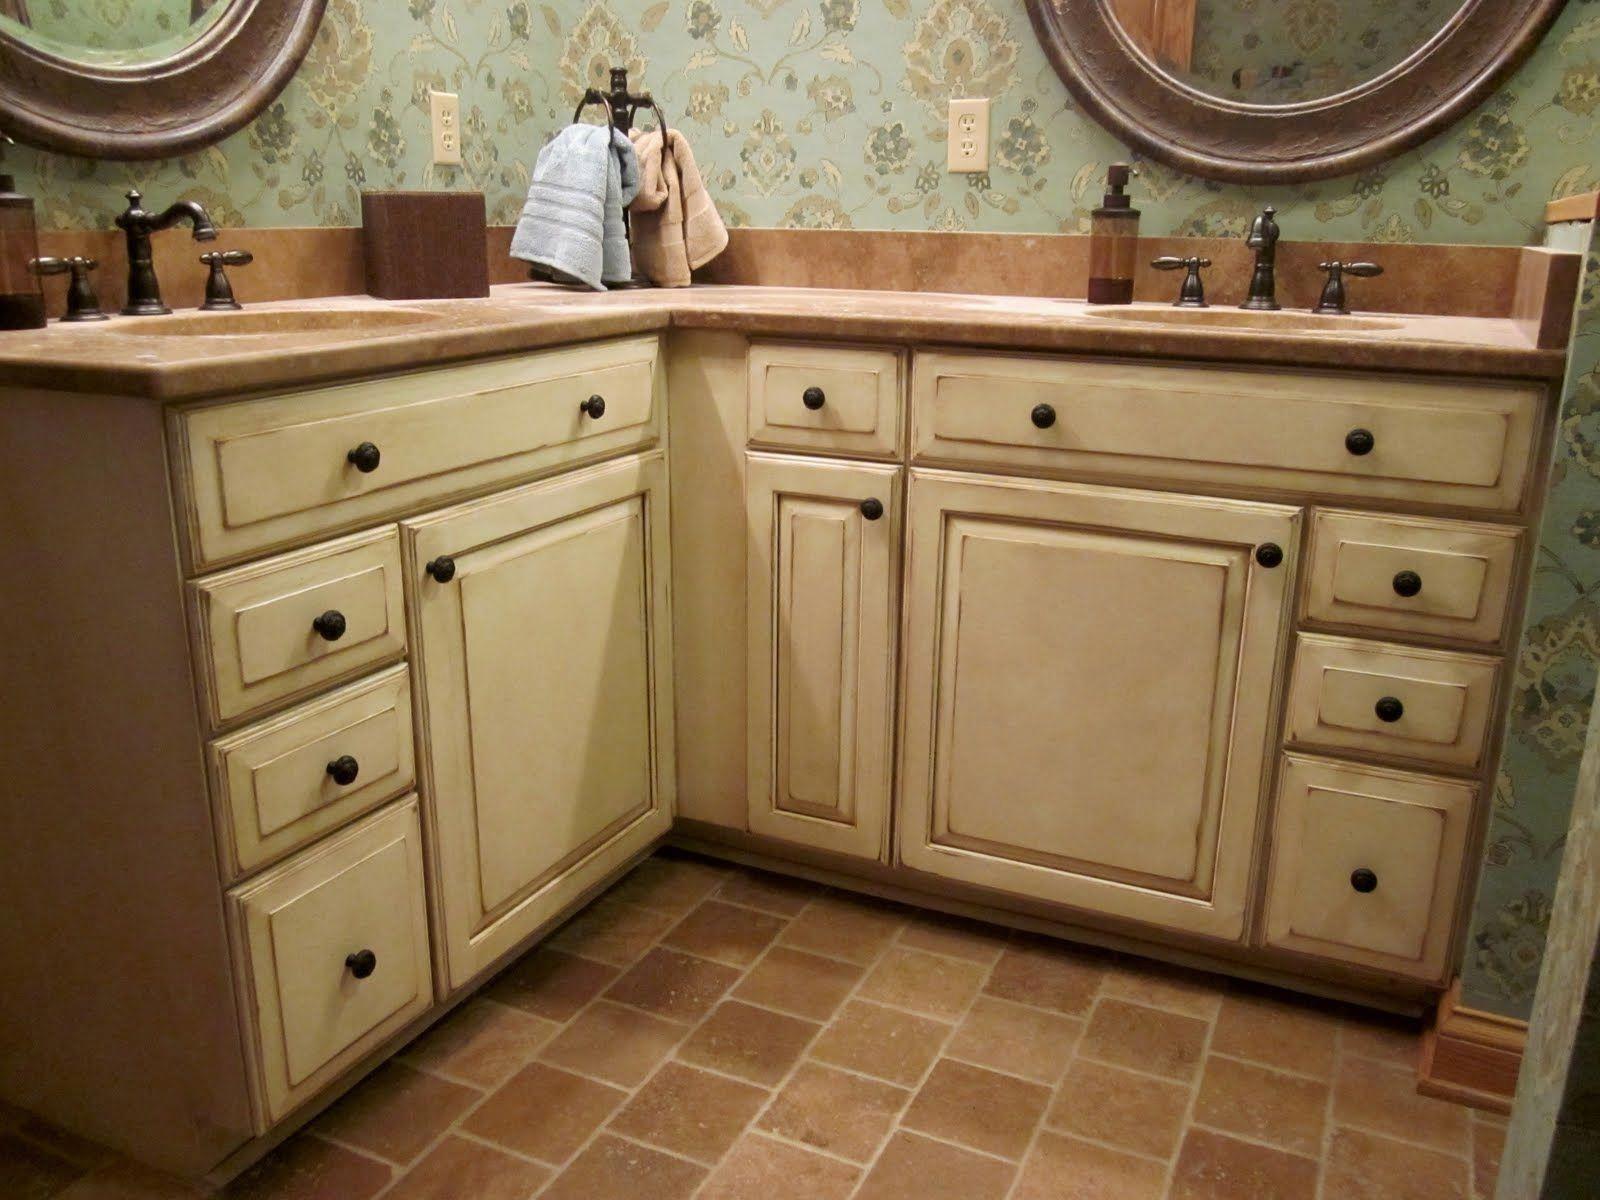 Cool antique kitchen cabinets   Distressed kitchen ...